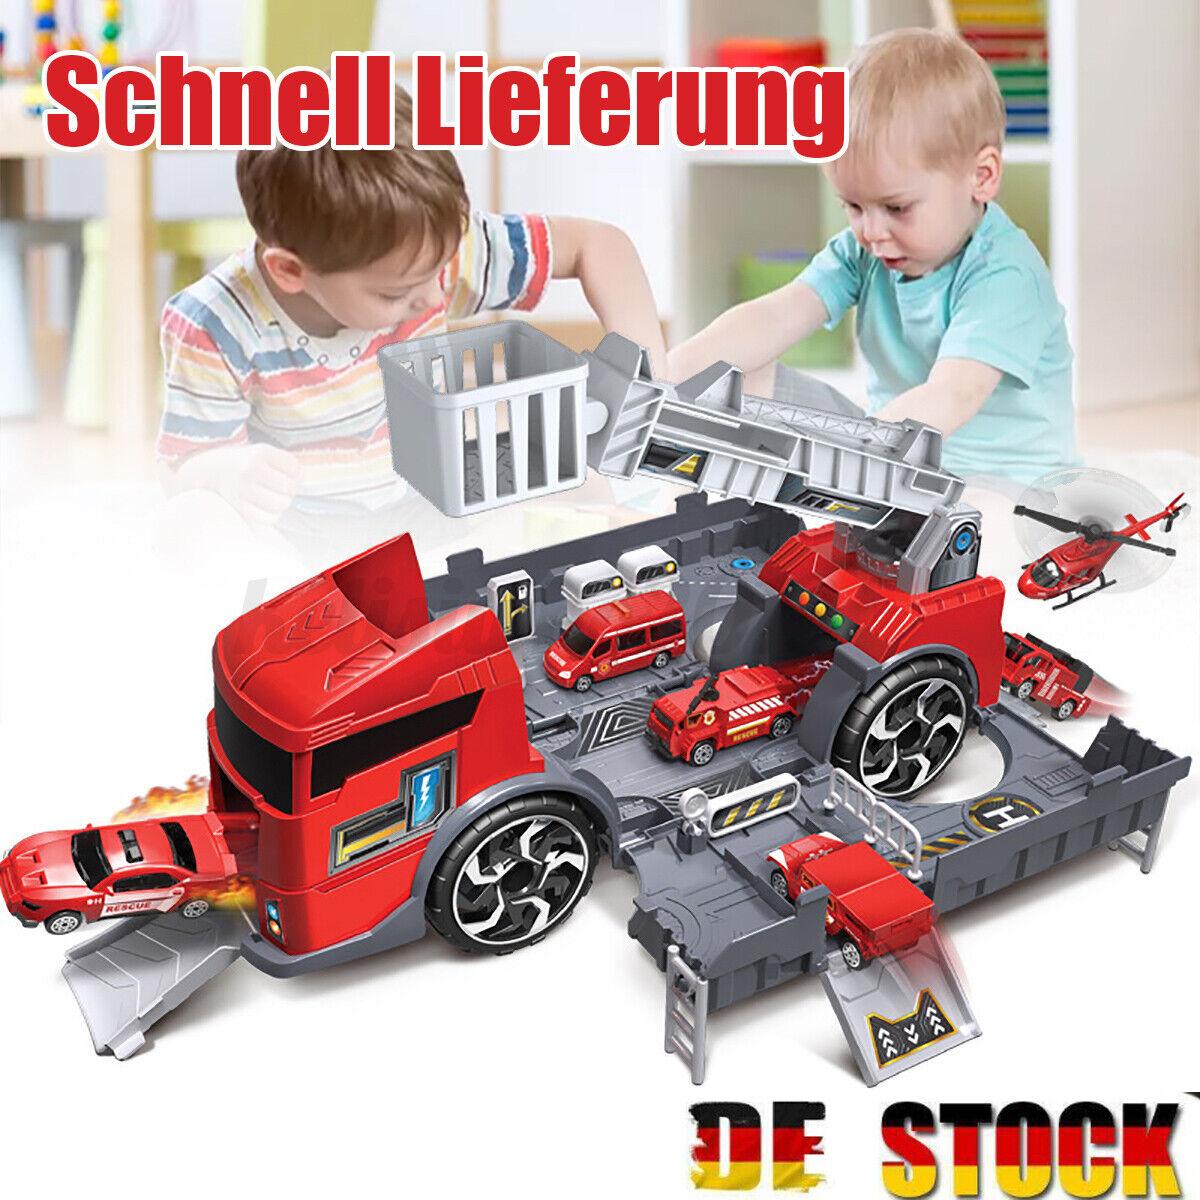 1:24 LKW Engineer Fahrzeug Feuerwehrauto Autos Parkhaus Truck Kinderspielzeug DE